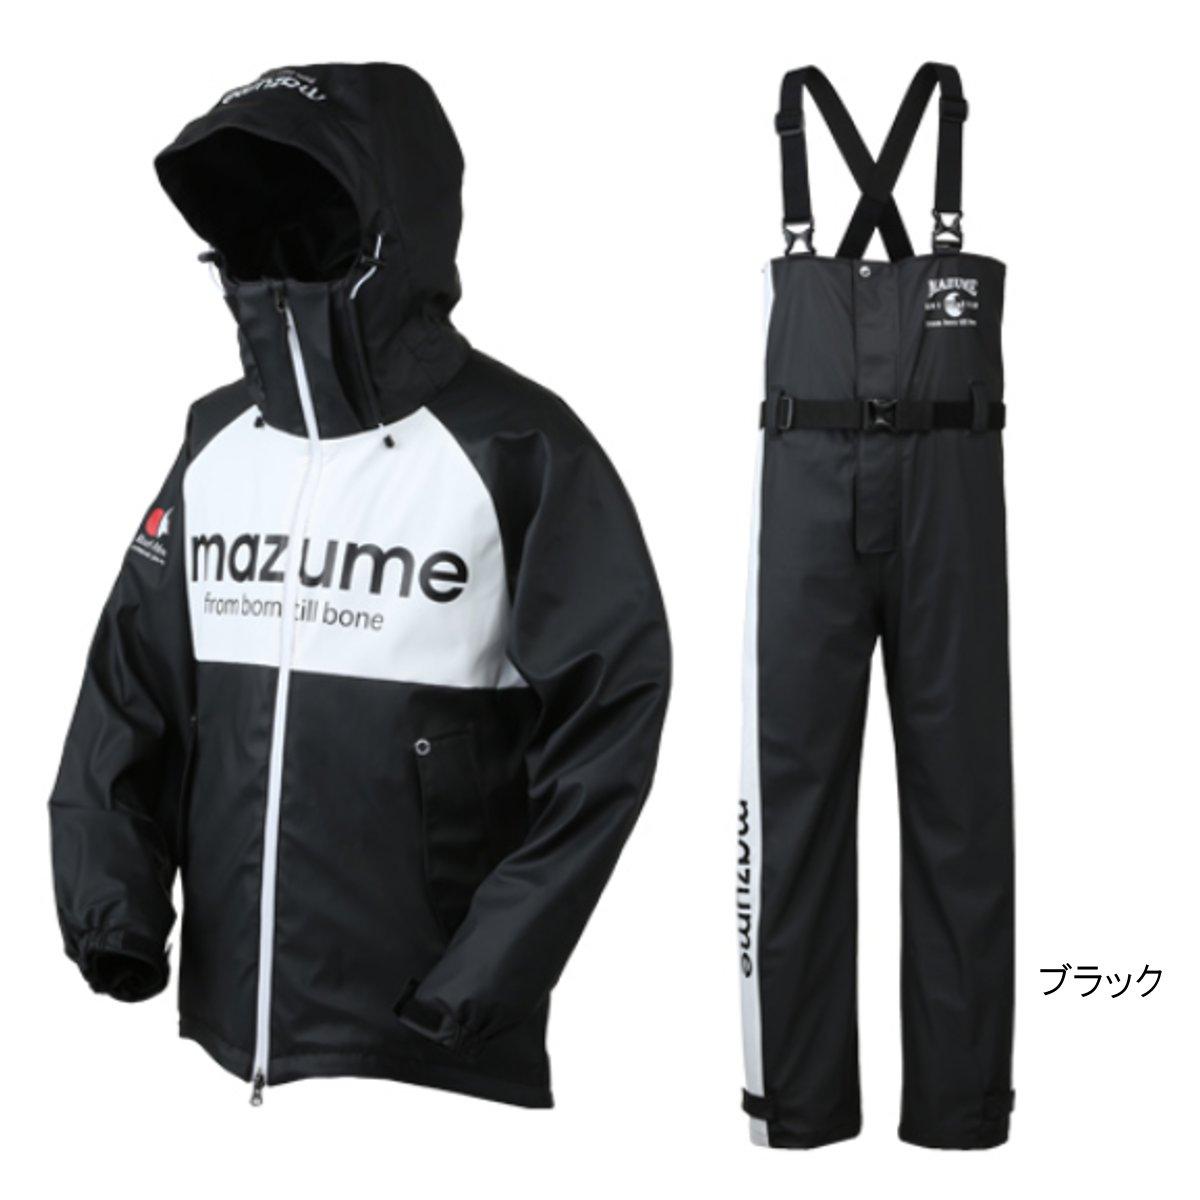 mazume ROUGH WATER レインスーツ II MZRS-383 LL ブラック